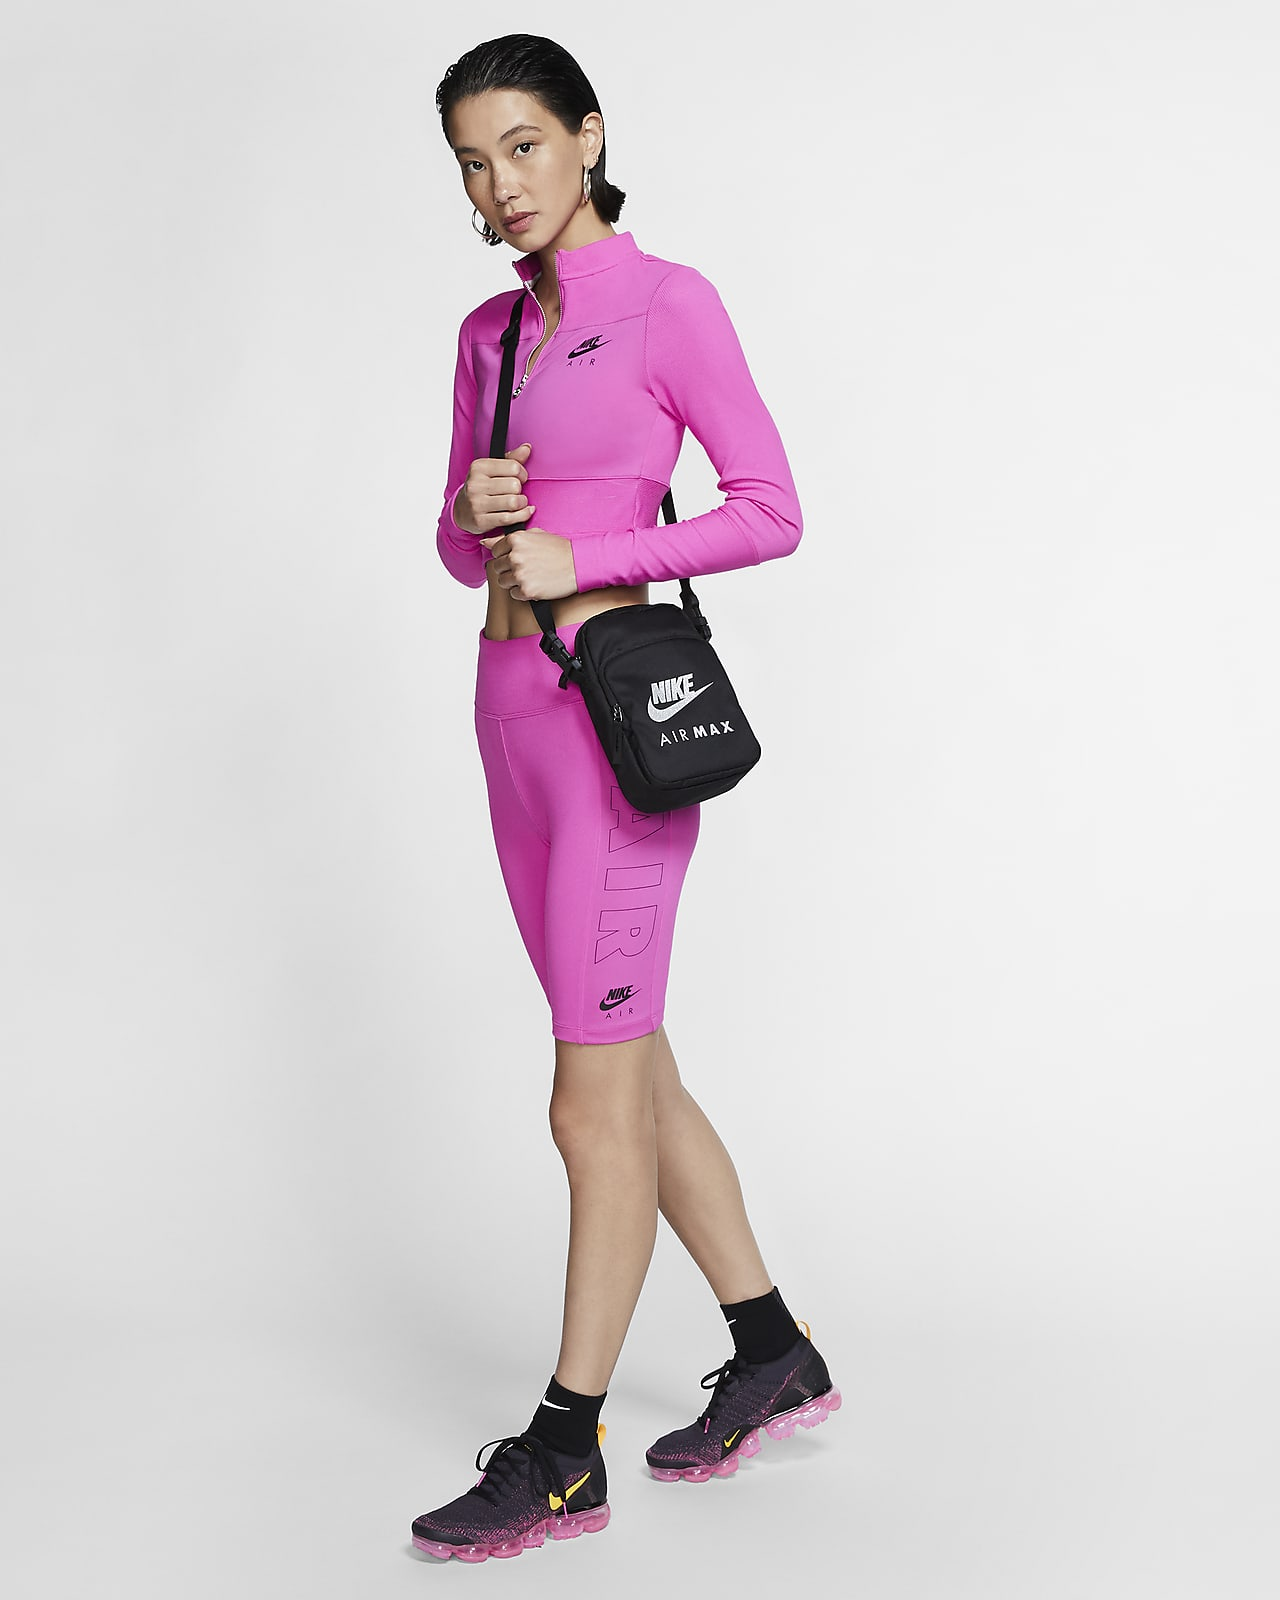 Soberano Conceder Tamano relativo  Nike Air Max 2.0 Cross-Body Bag (Small Items). Nike ZA